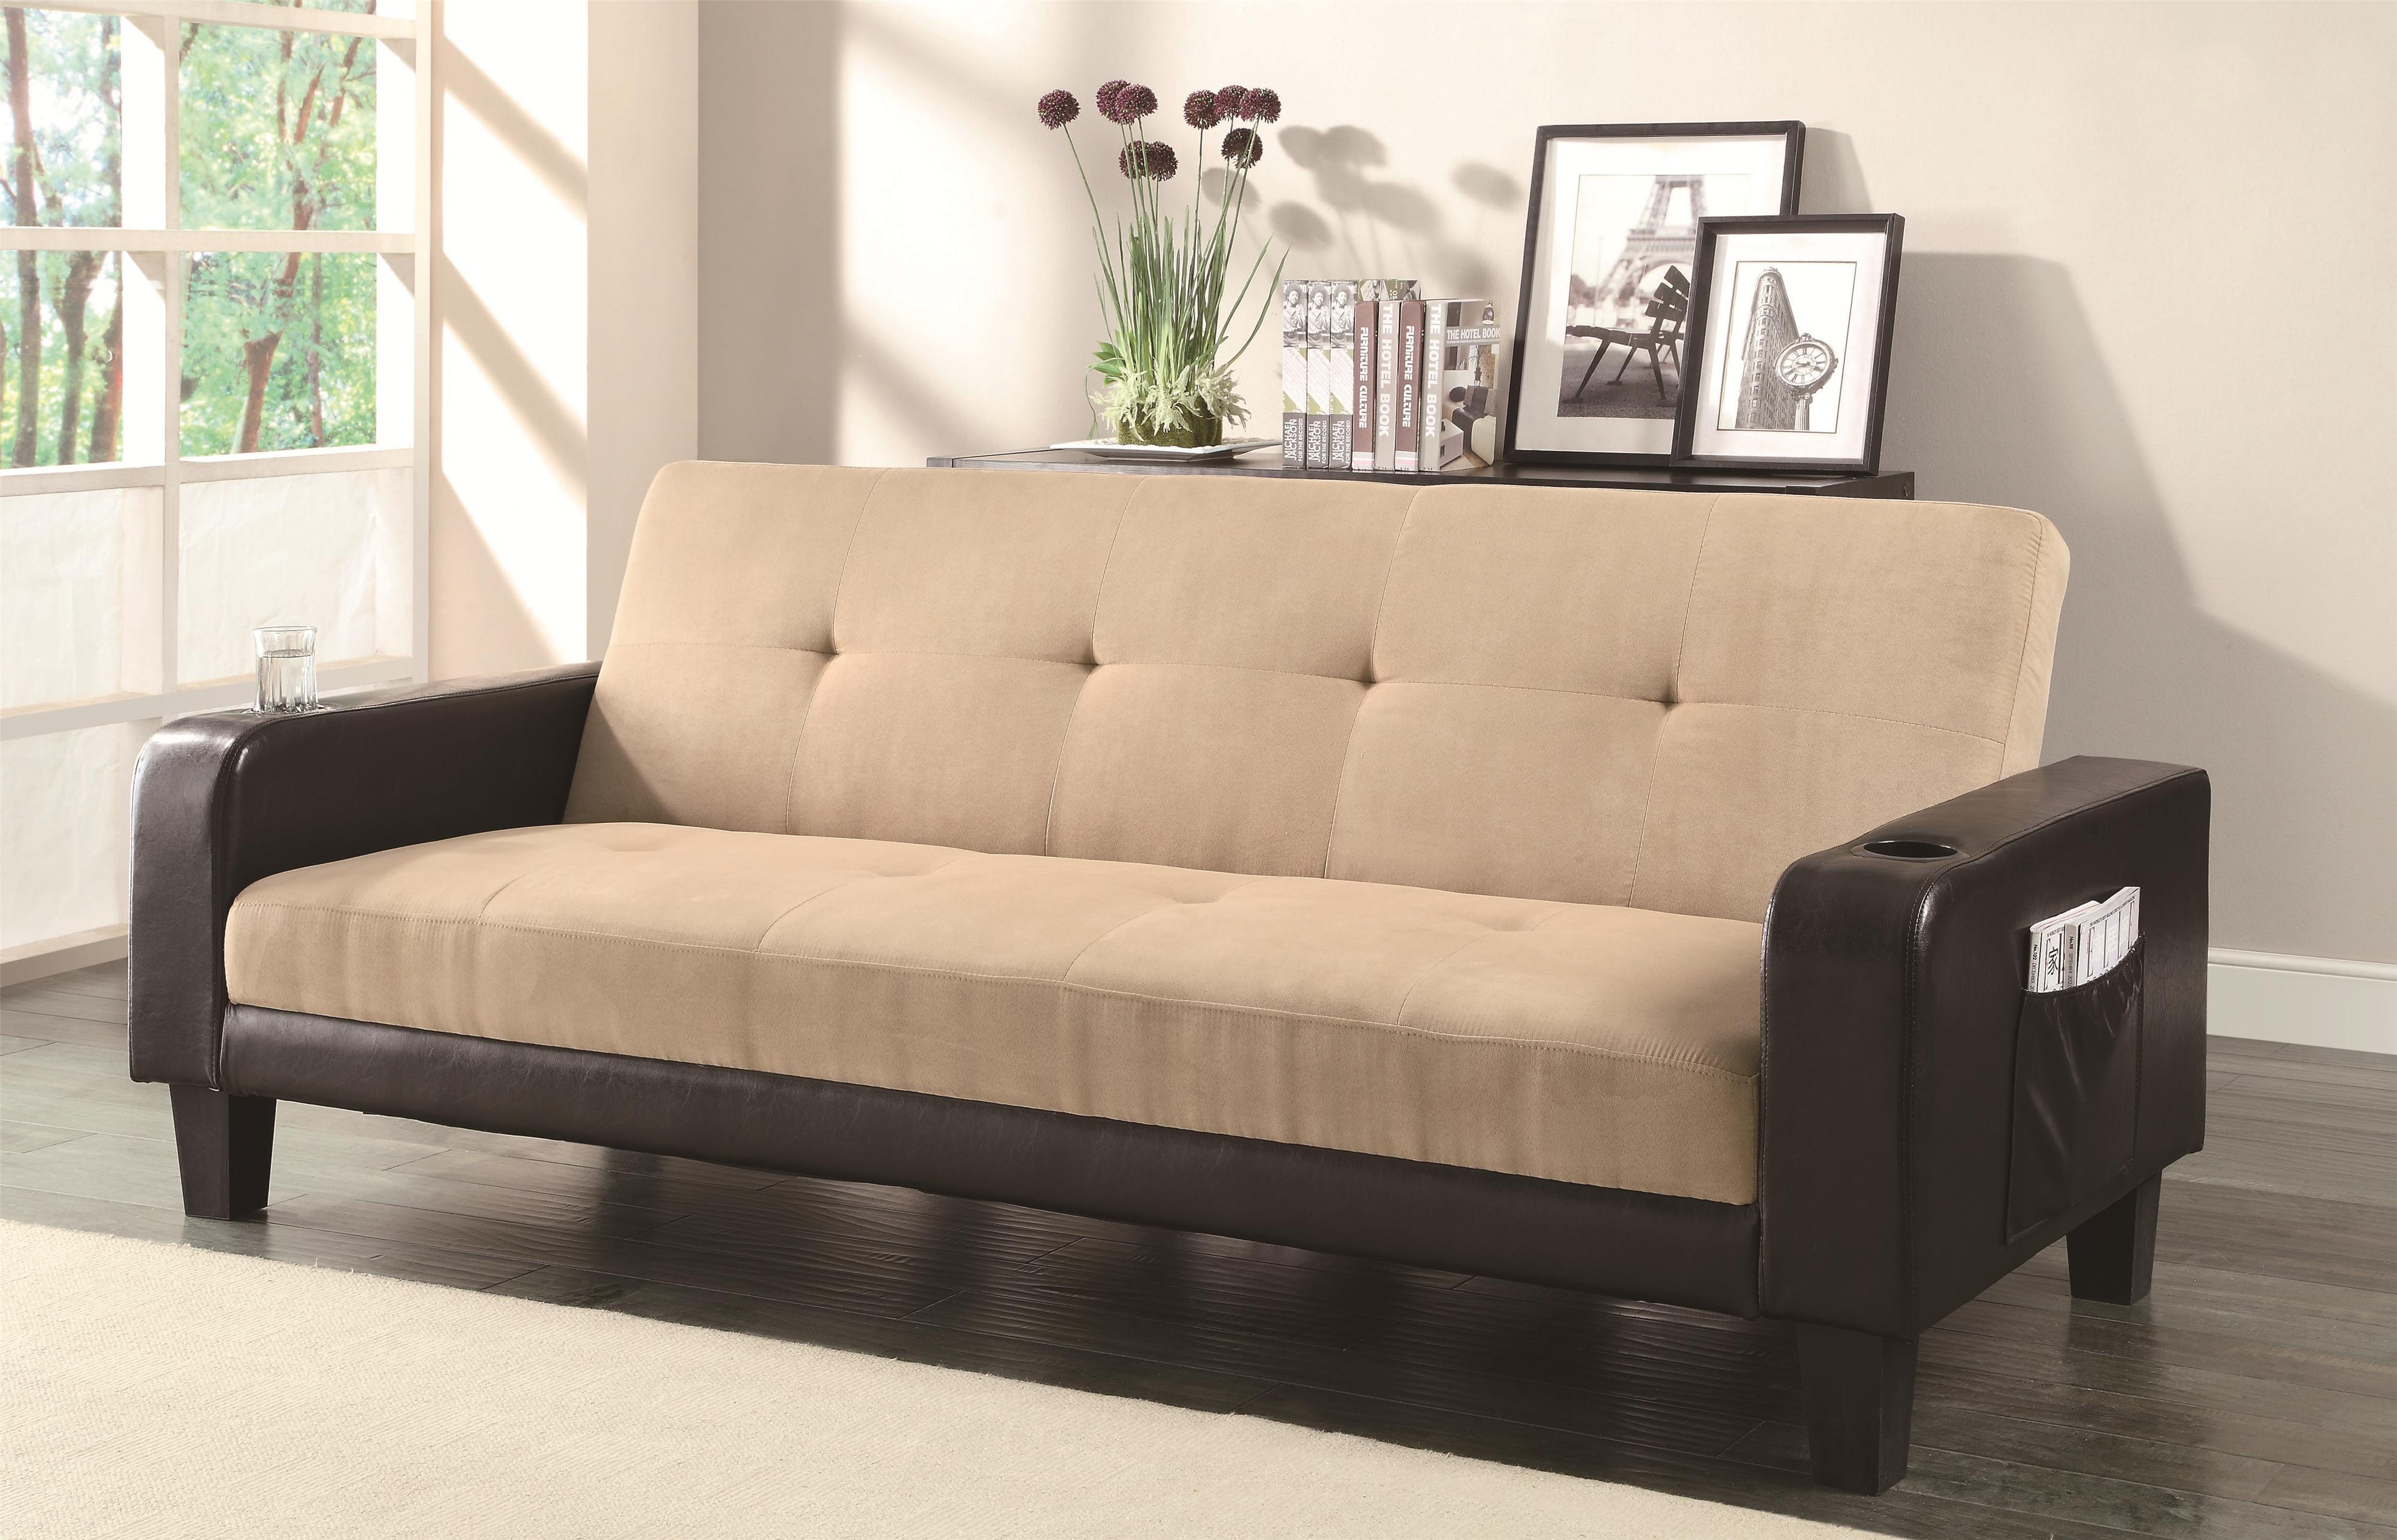 Coaster Sofa Beds and Futons -  Adjustable Sofa - Item Number: 300295